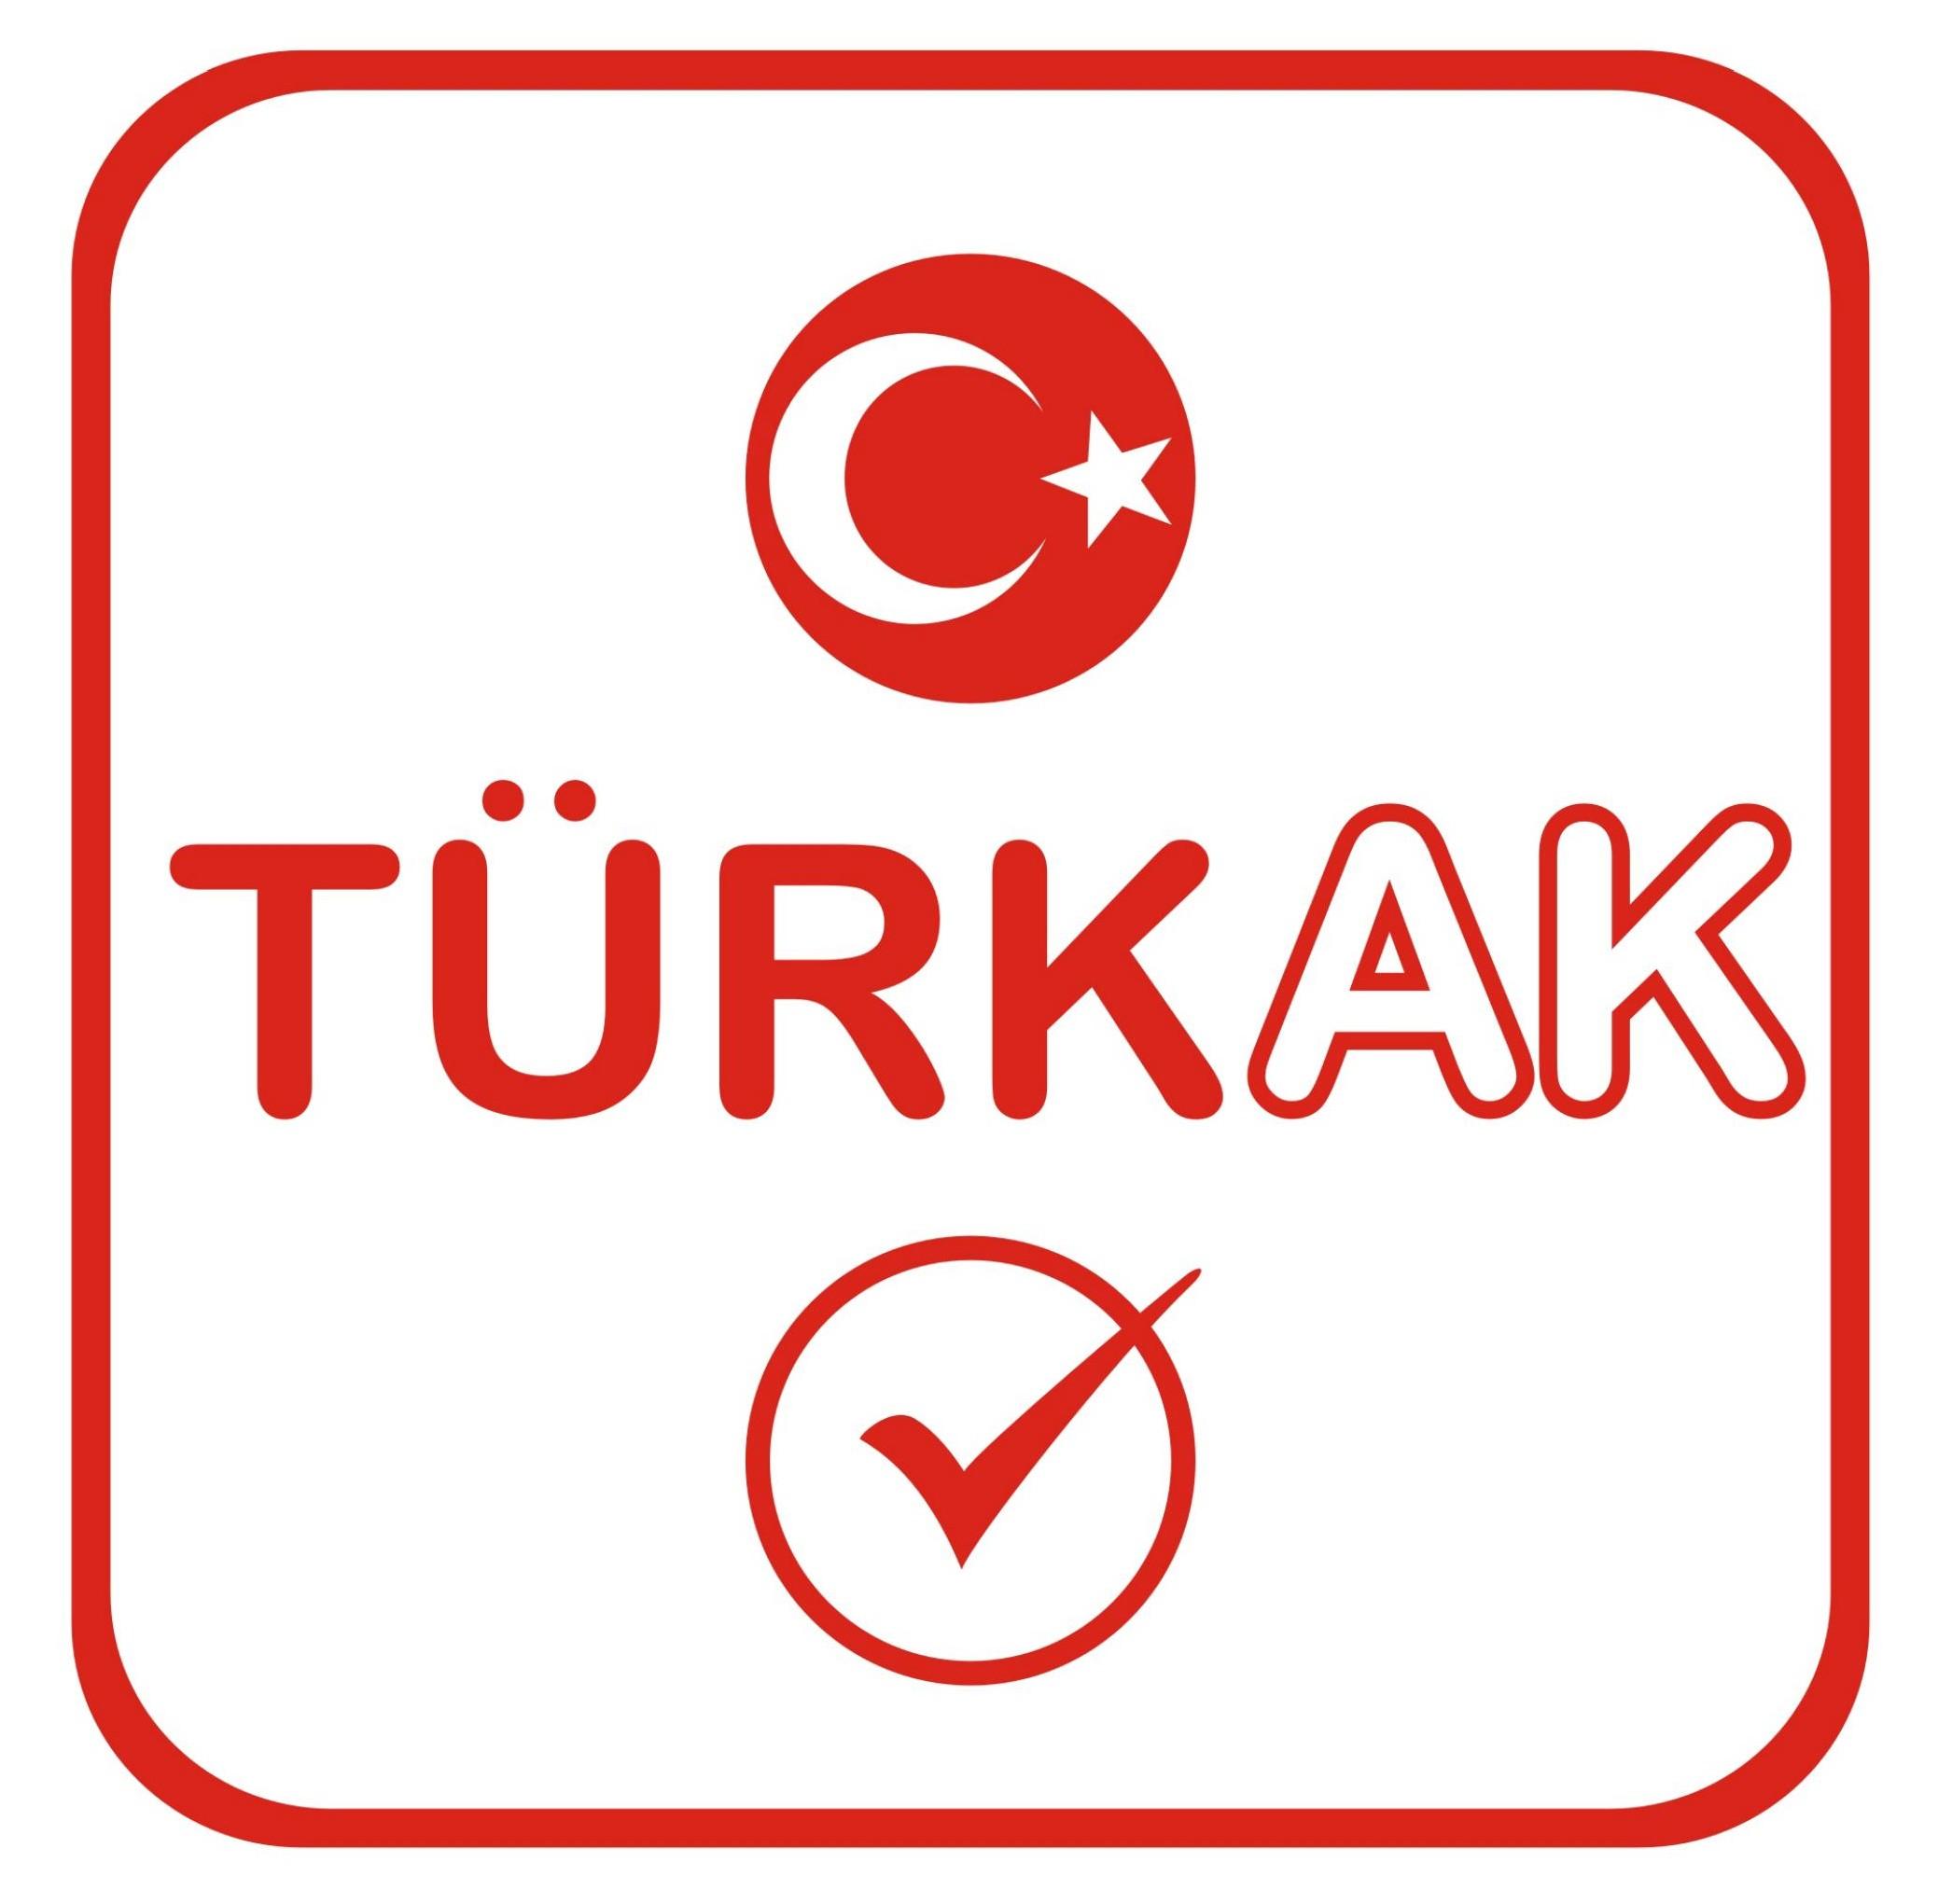 turkak-logo